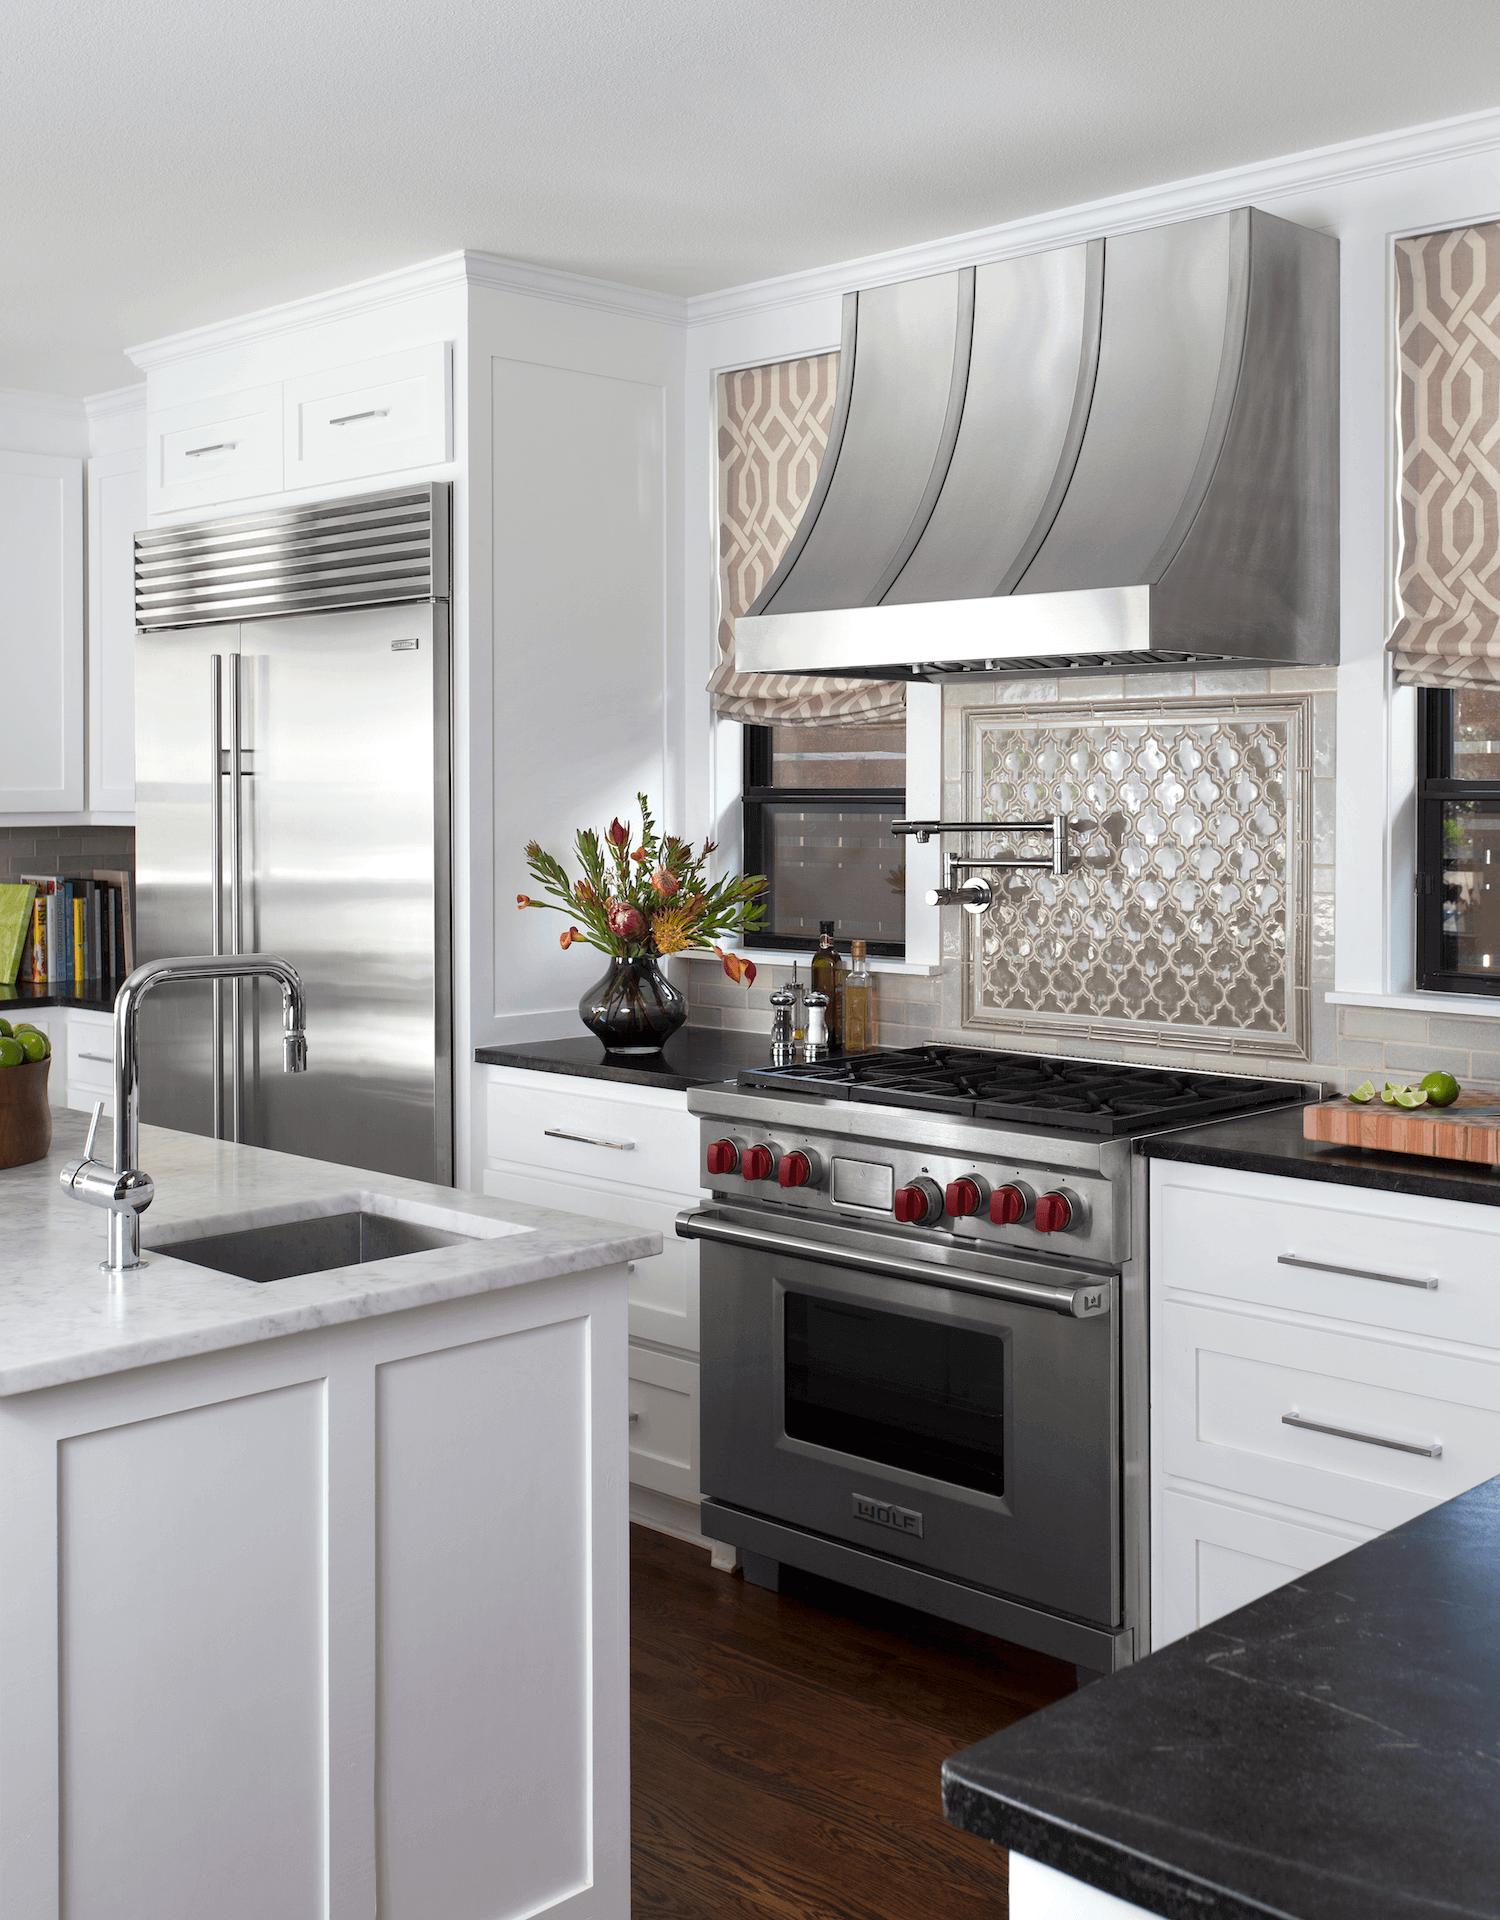 Tarrytown Kitchen | Robin Colton Interior Design Studio Austin Texas | www.robincolton.com